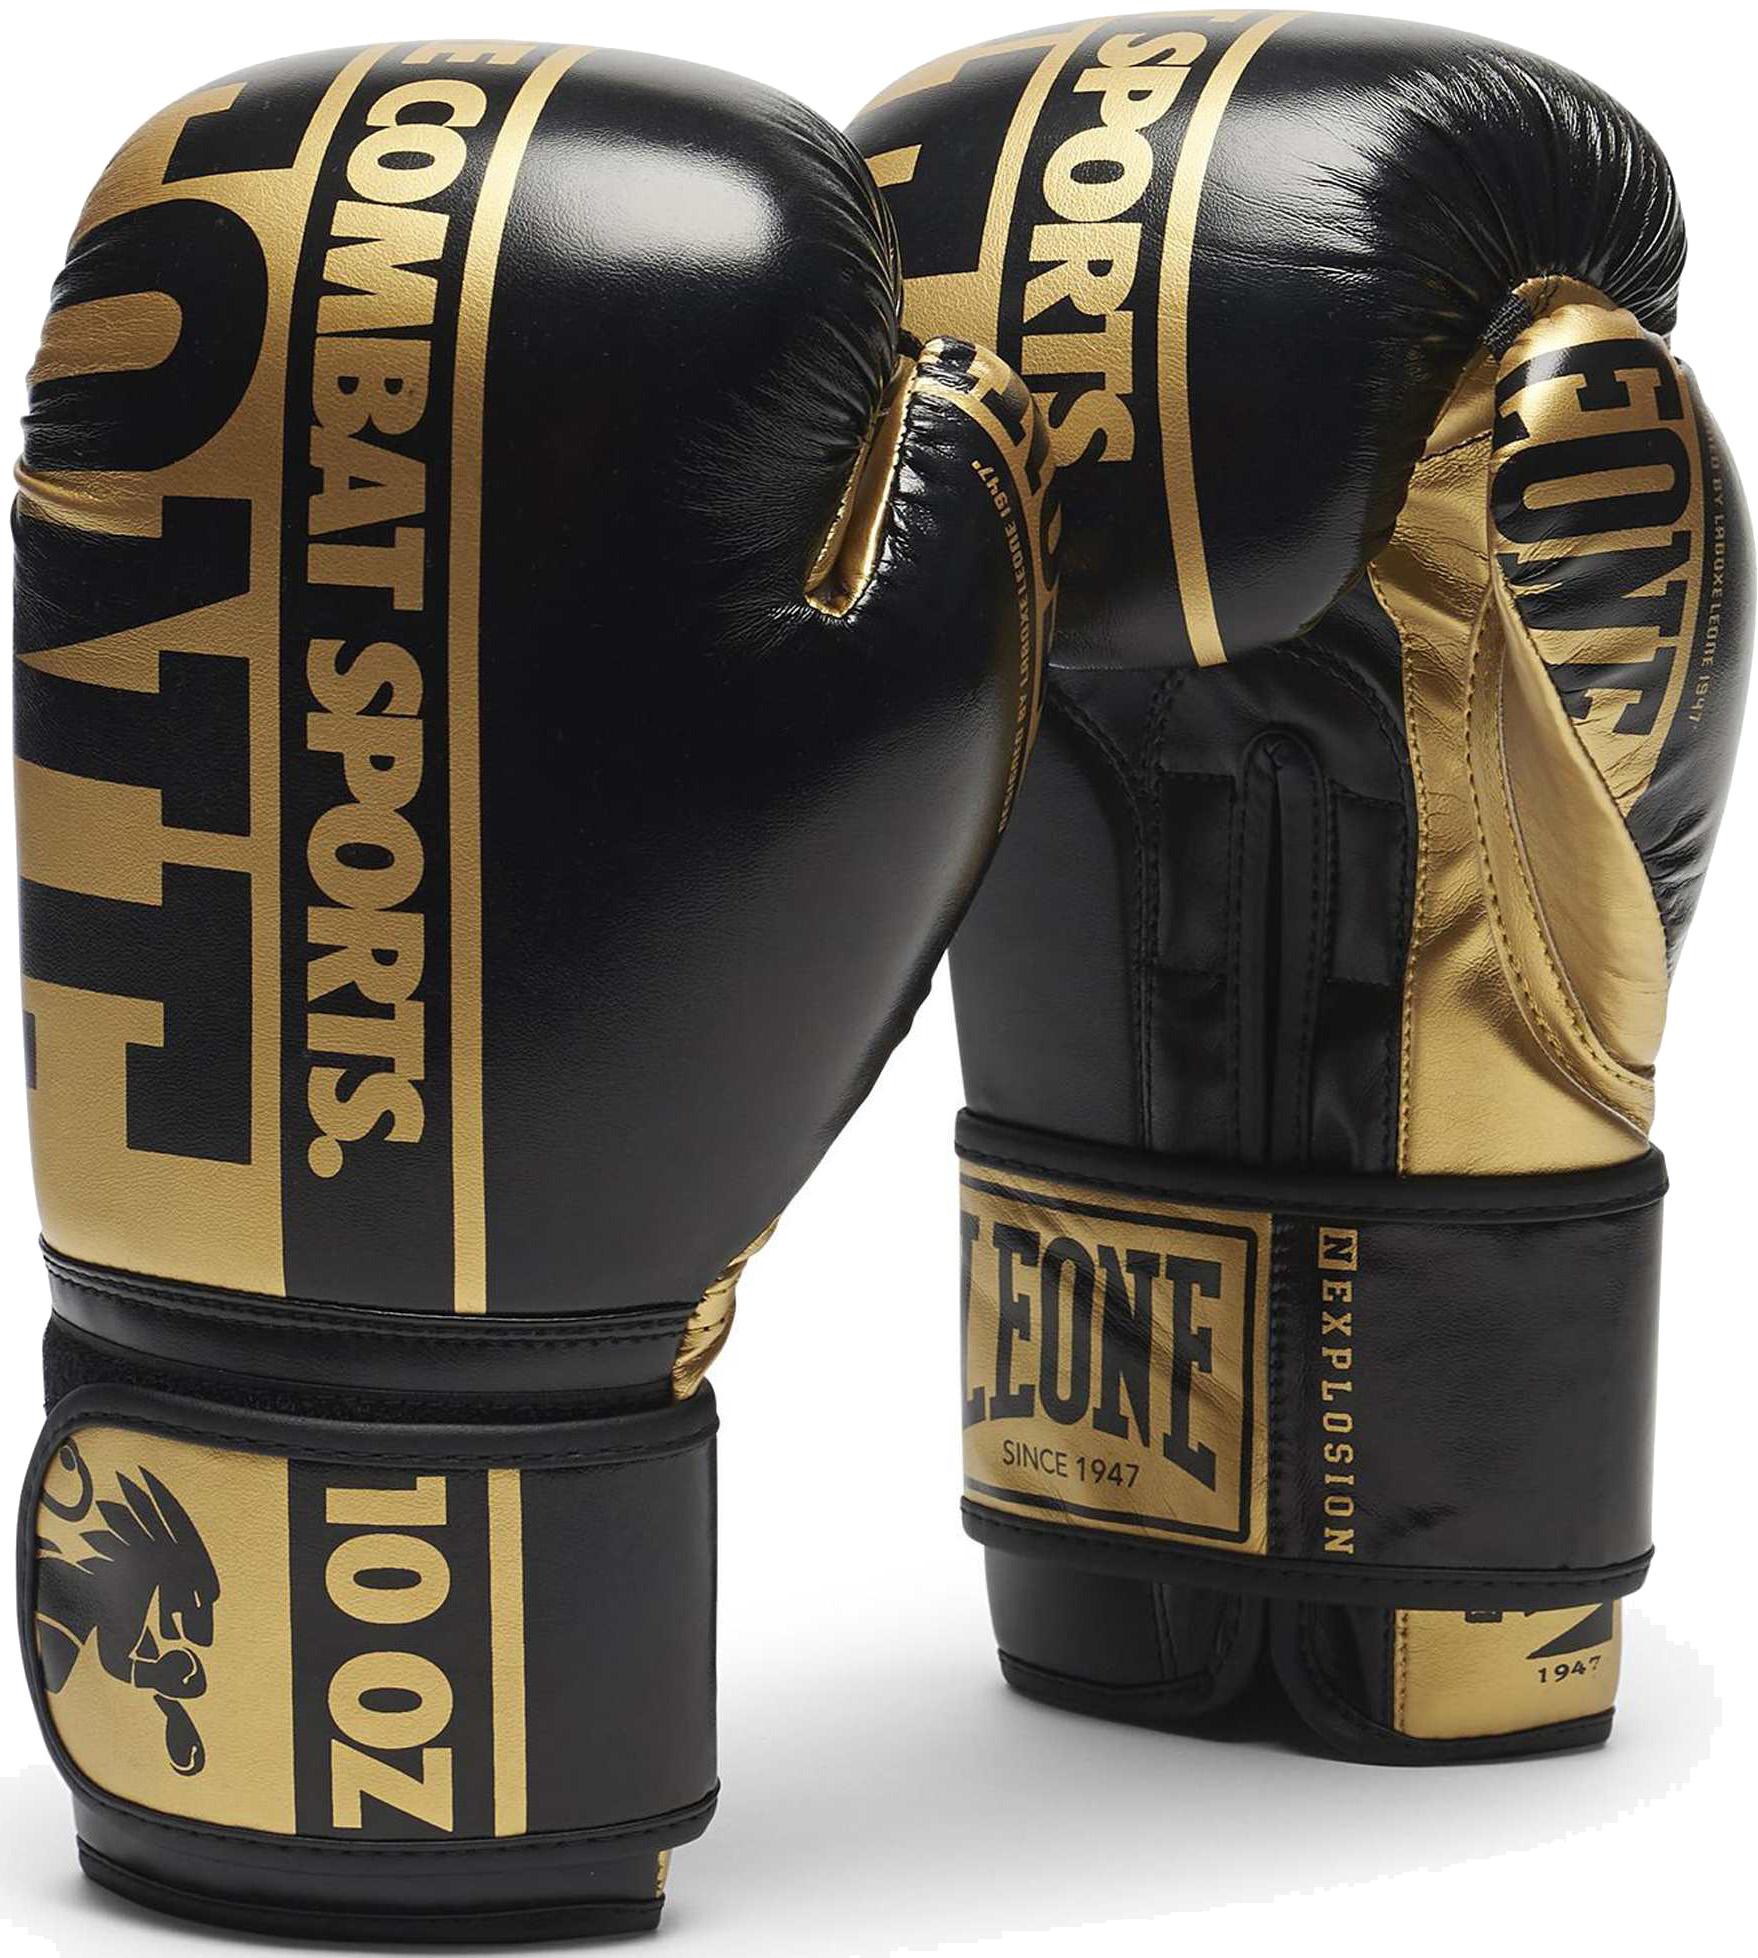 Gants de boxe Leone Nexplosion